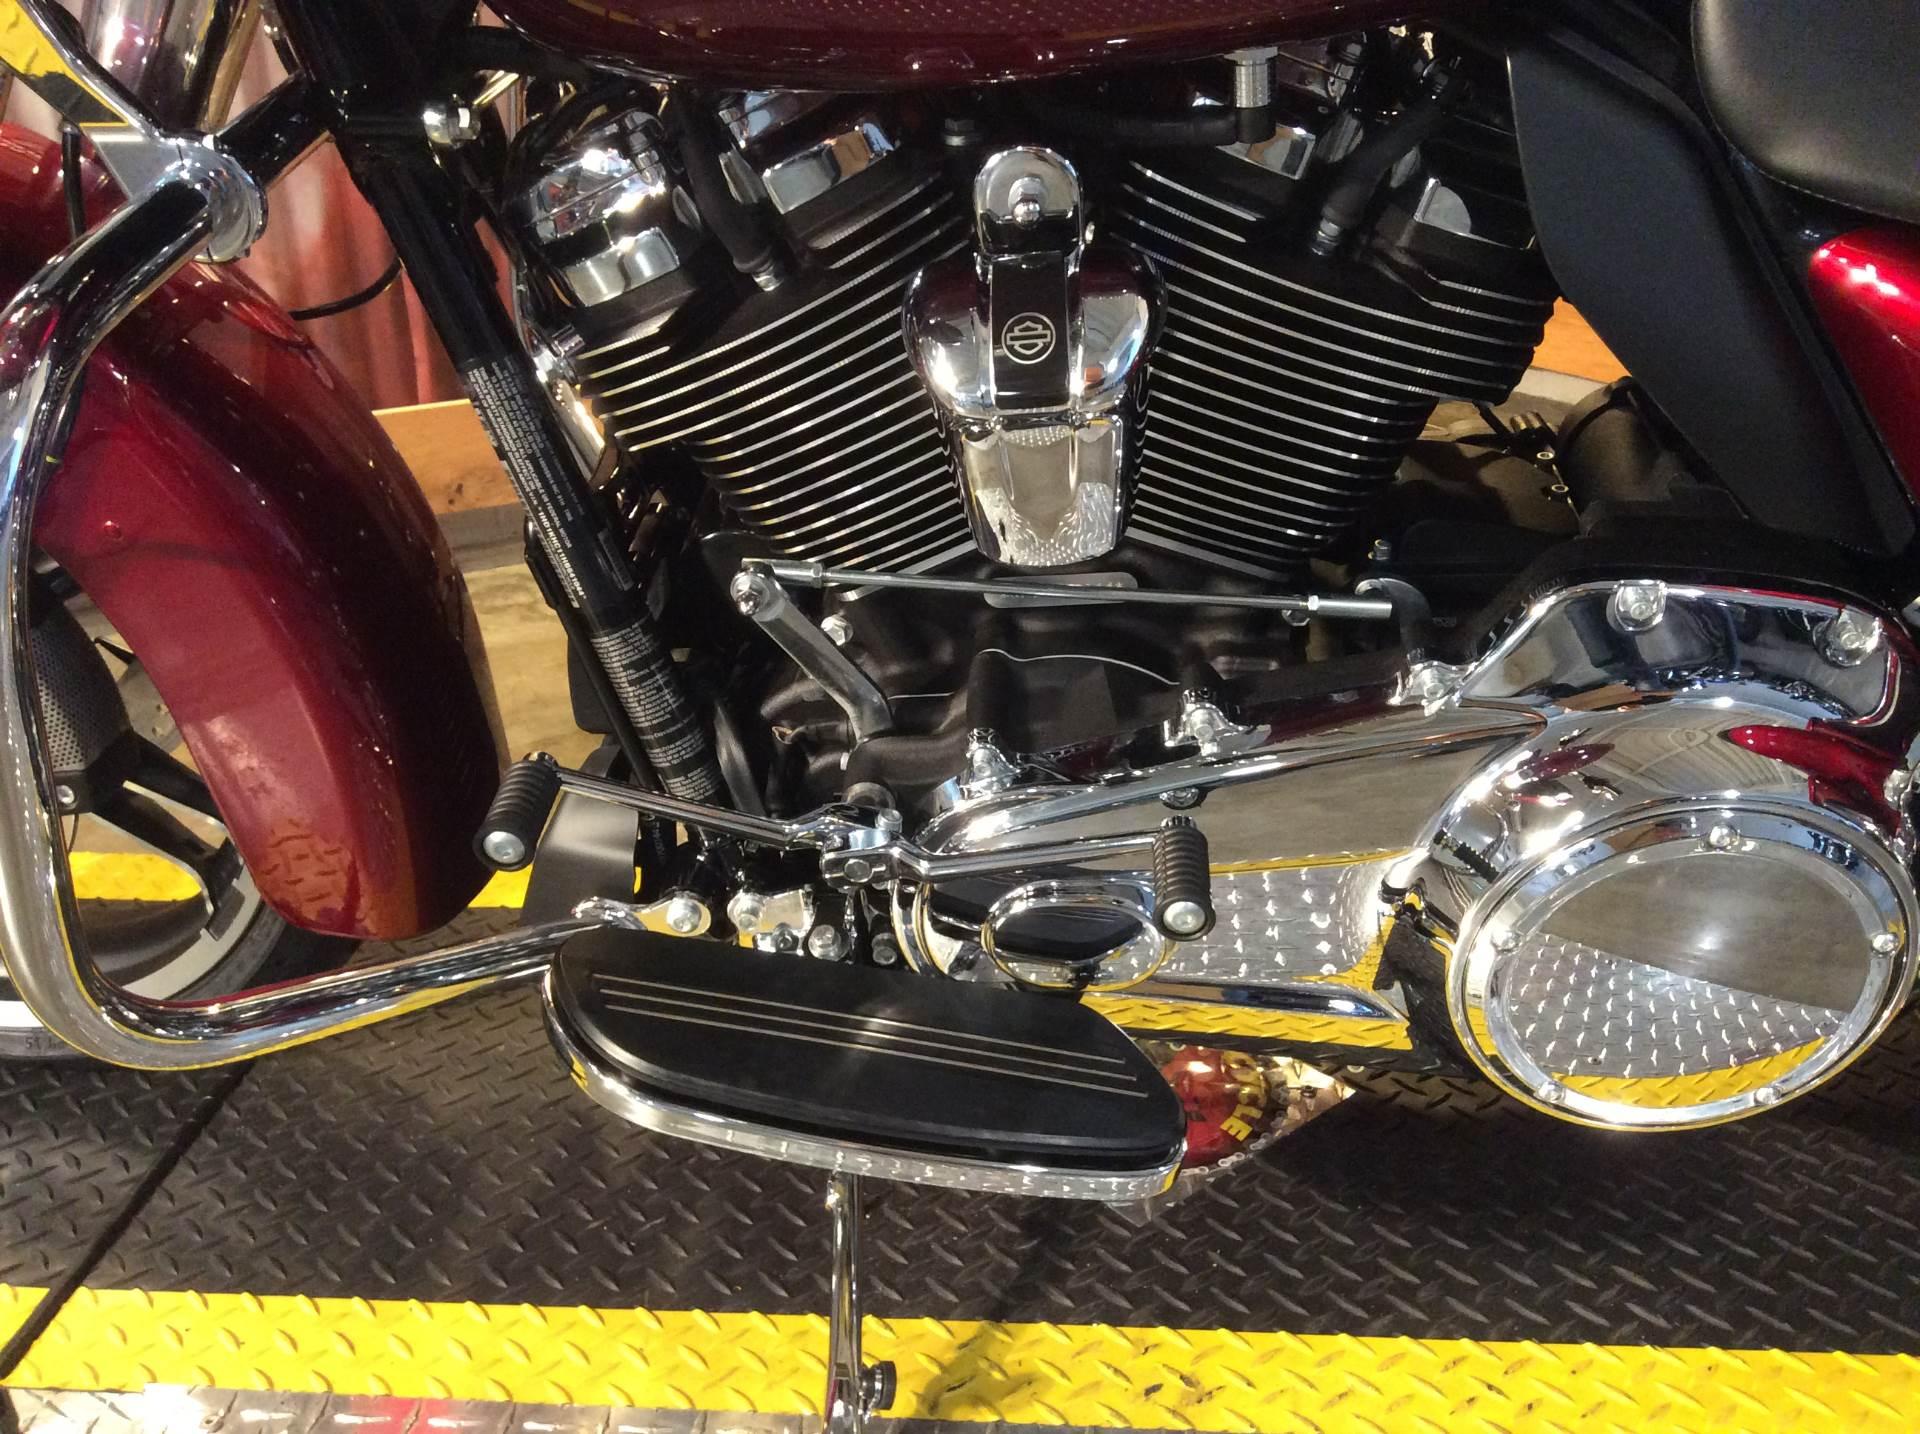 2017 Harley-Davidson Street Glide® Special in Southaven, Mississippi